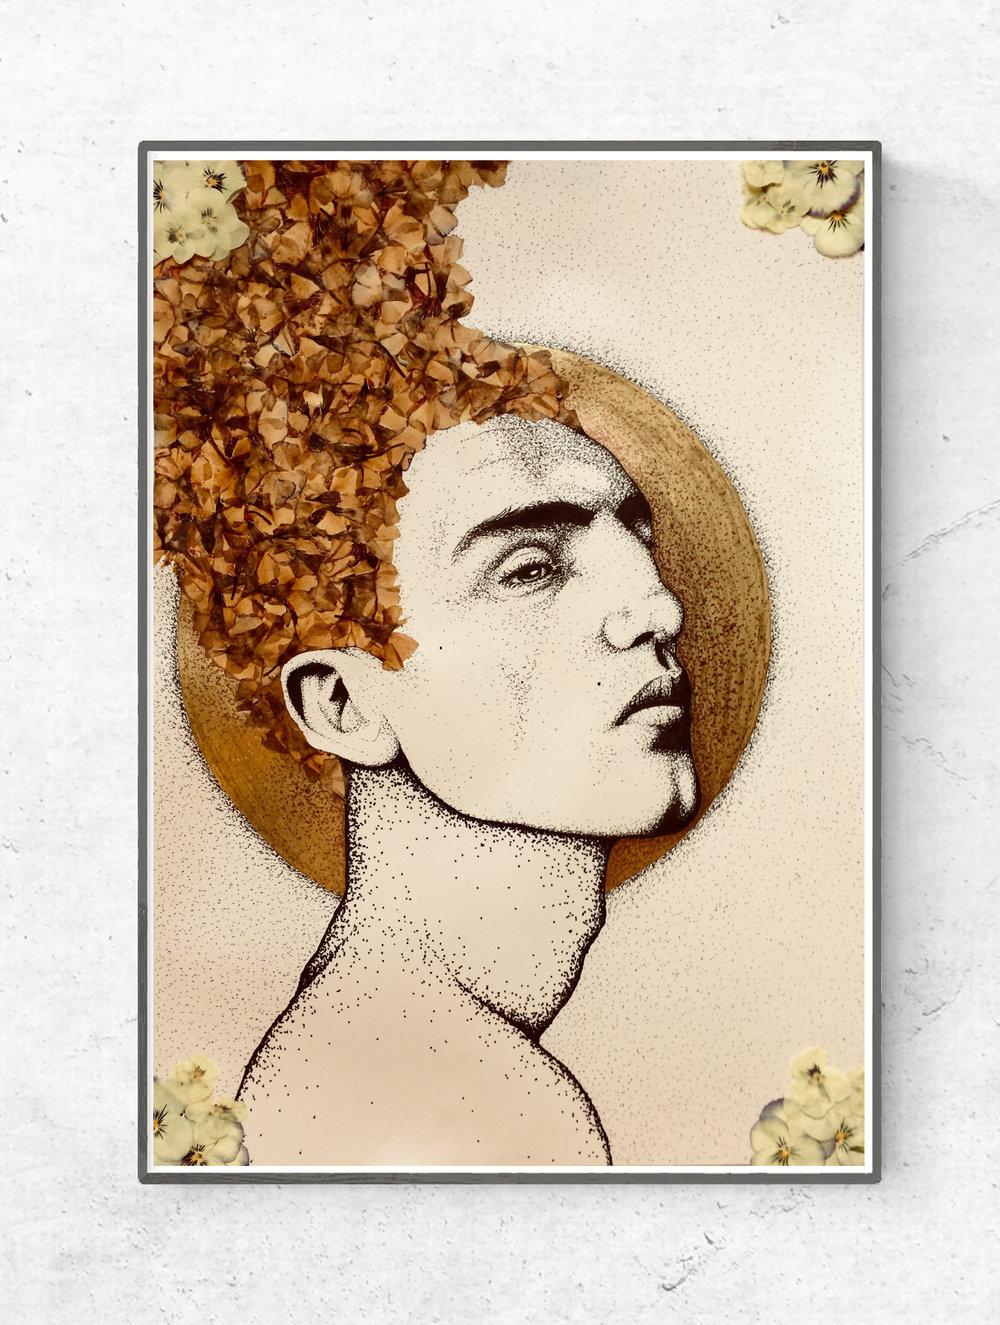 'Midazolam' ink & gold leaf drawing by Billy Byrne